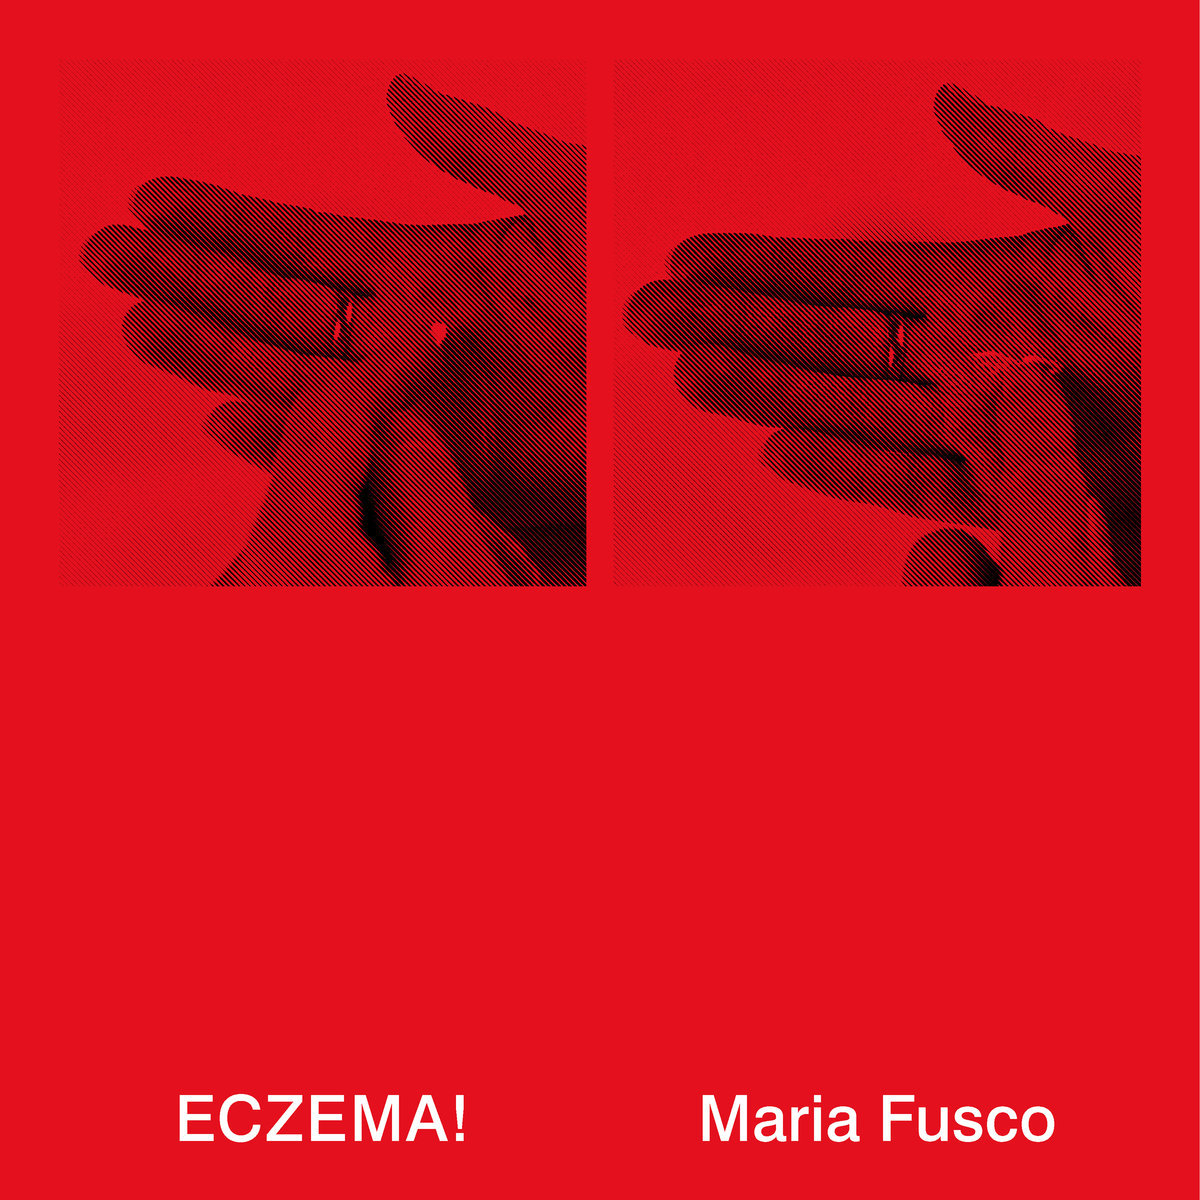 ECZEMA! — Maria Fusco - Accidental Records, Mar. 2019